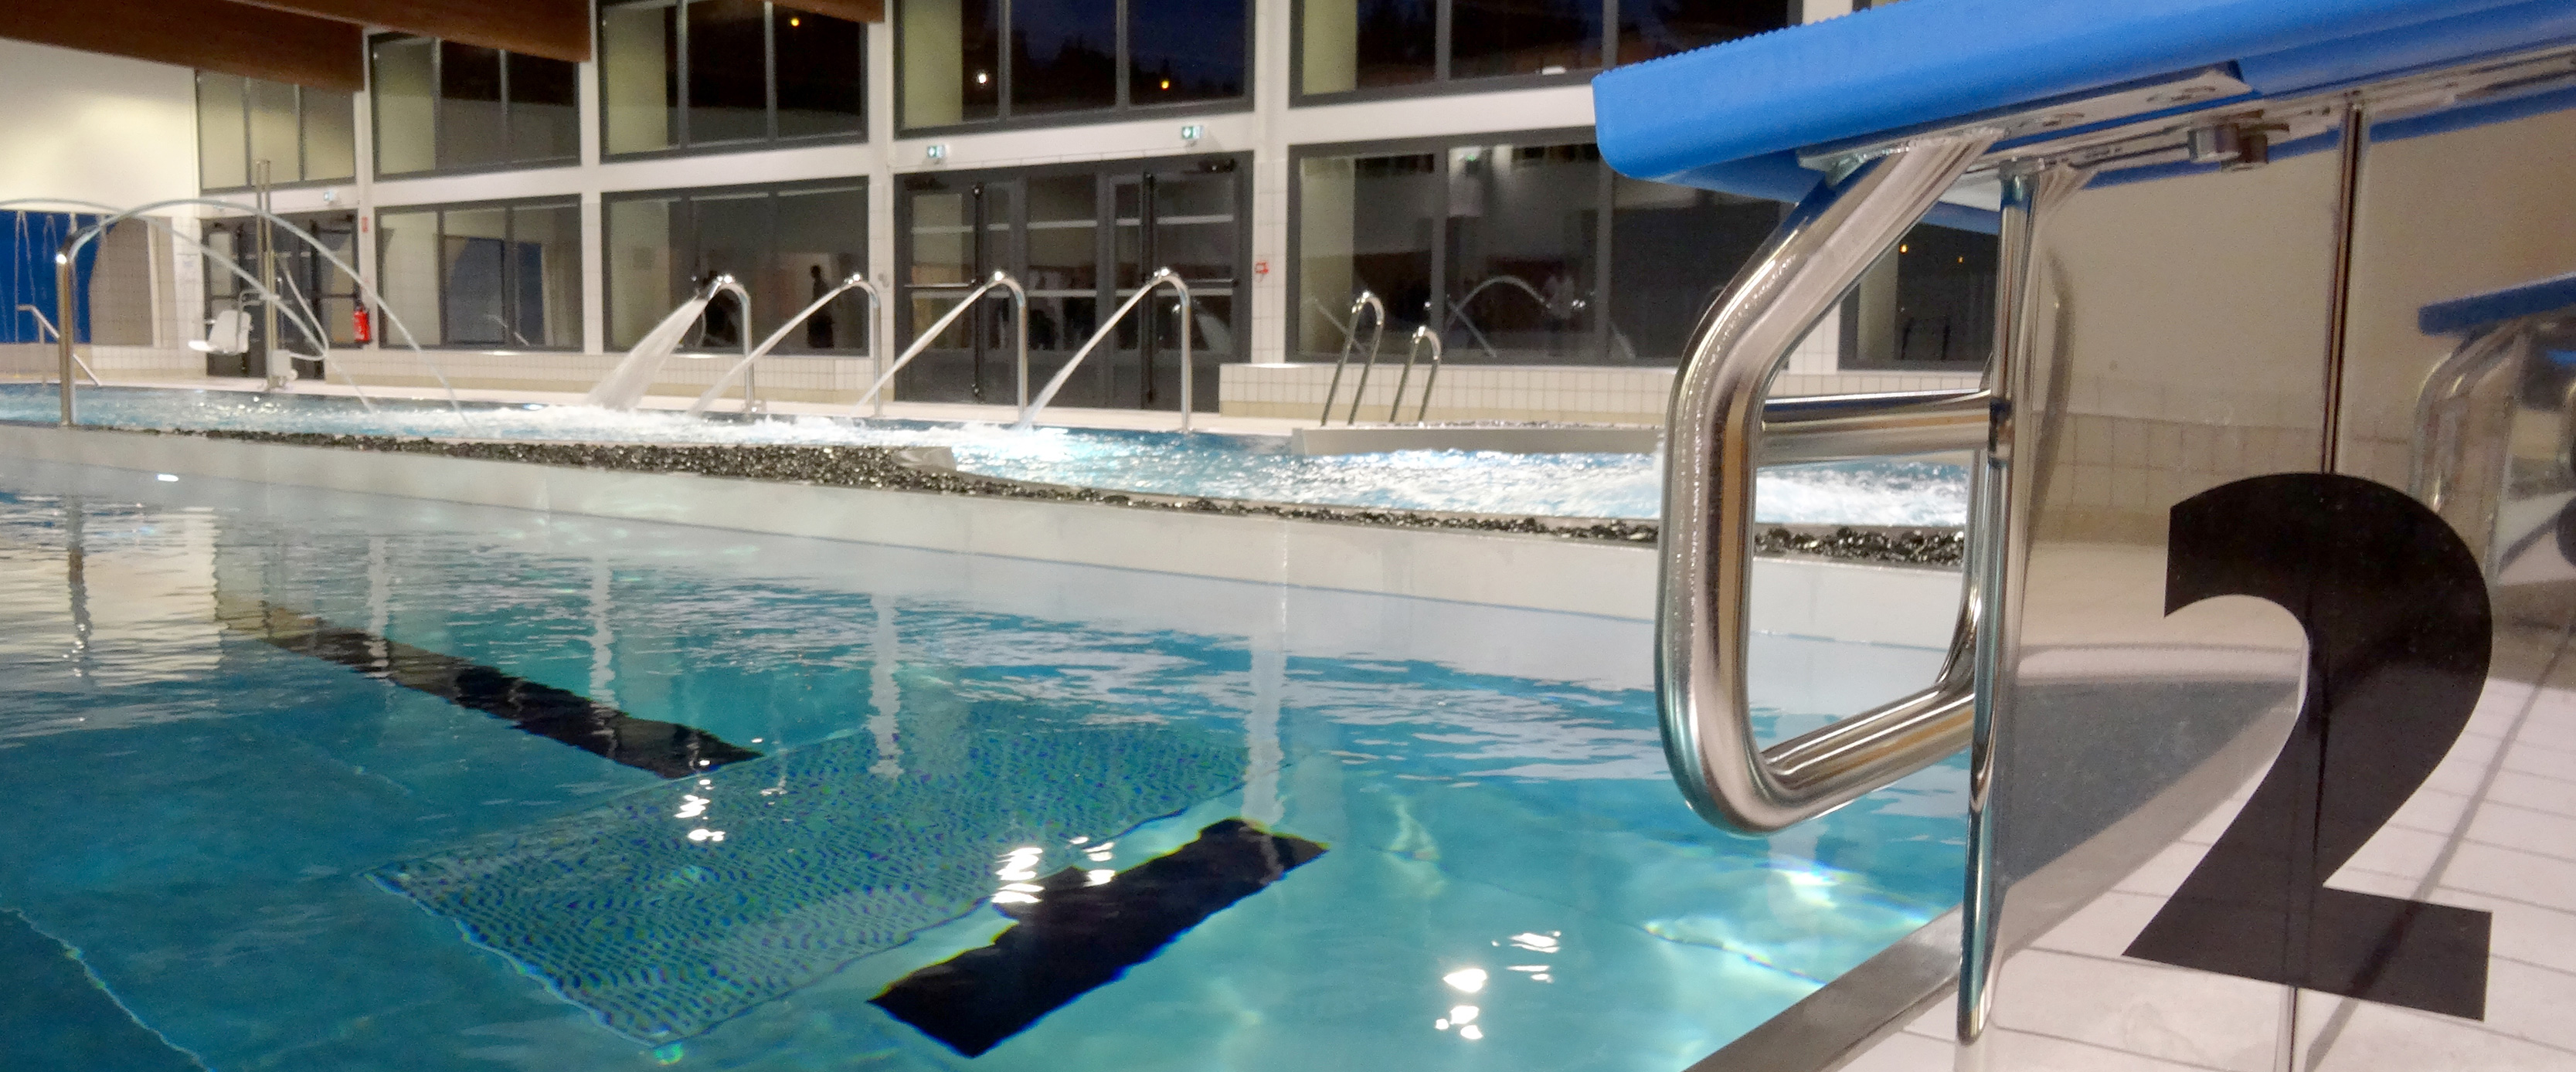 piscine1-centre-ludosportif-loisirs-quotidien.jpg